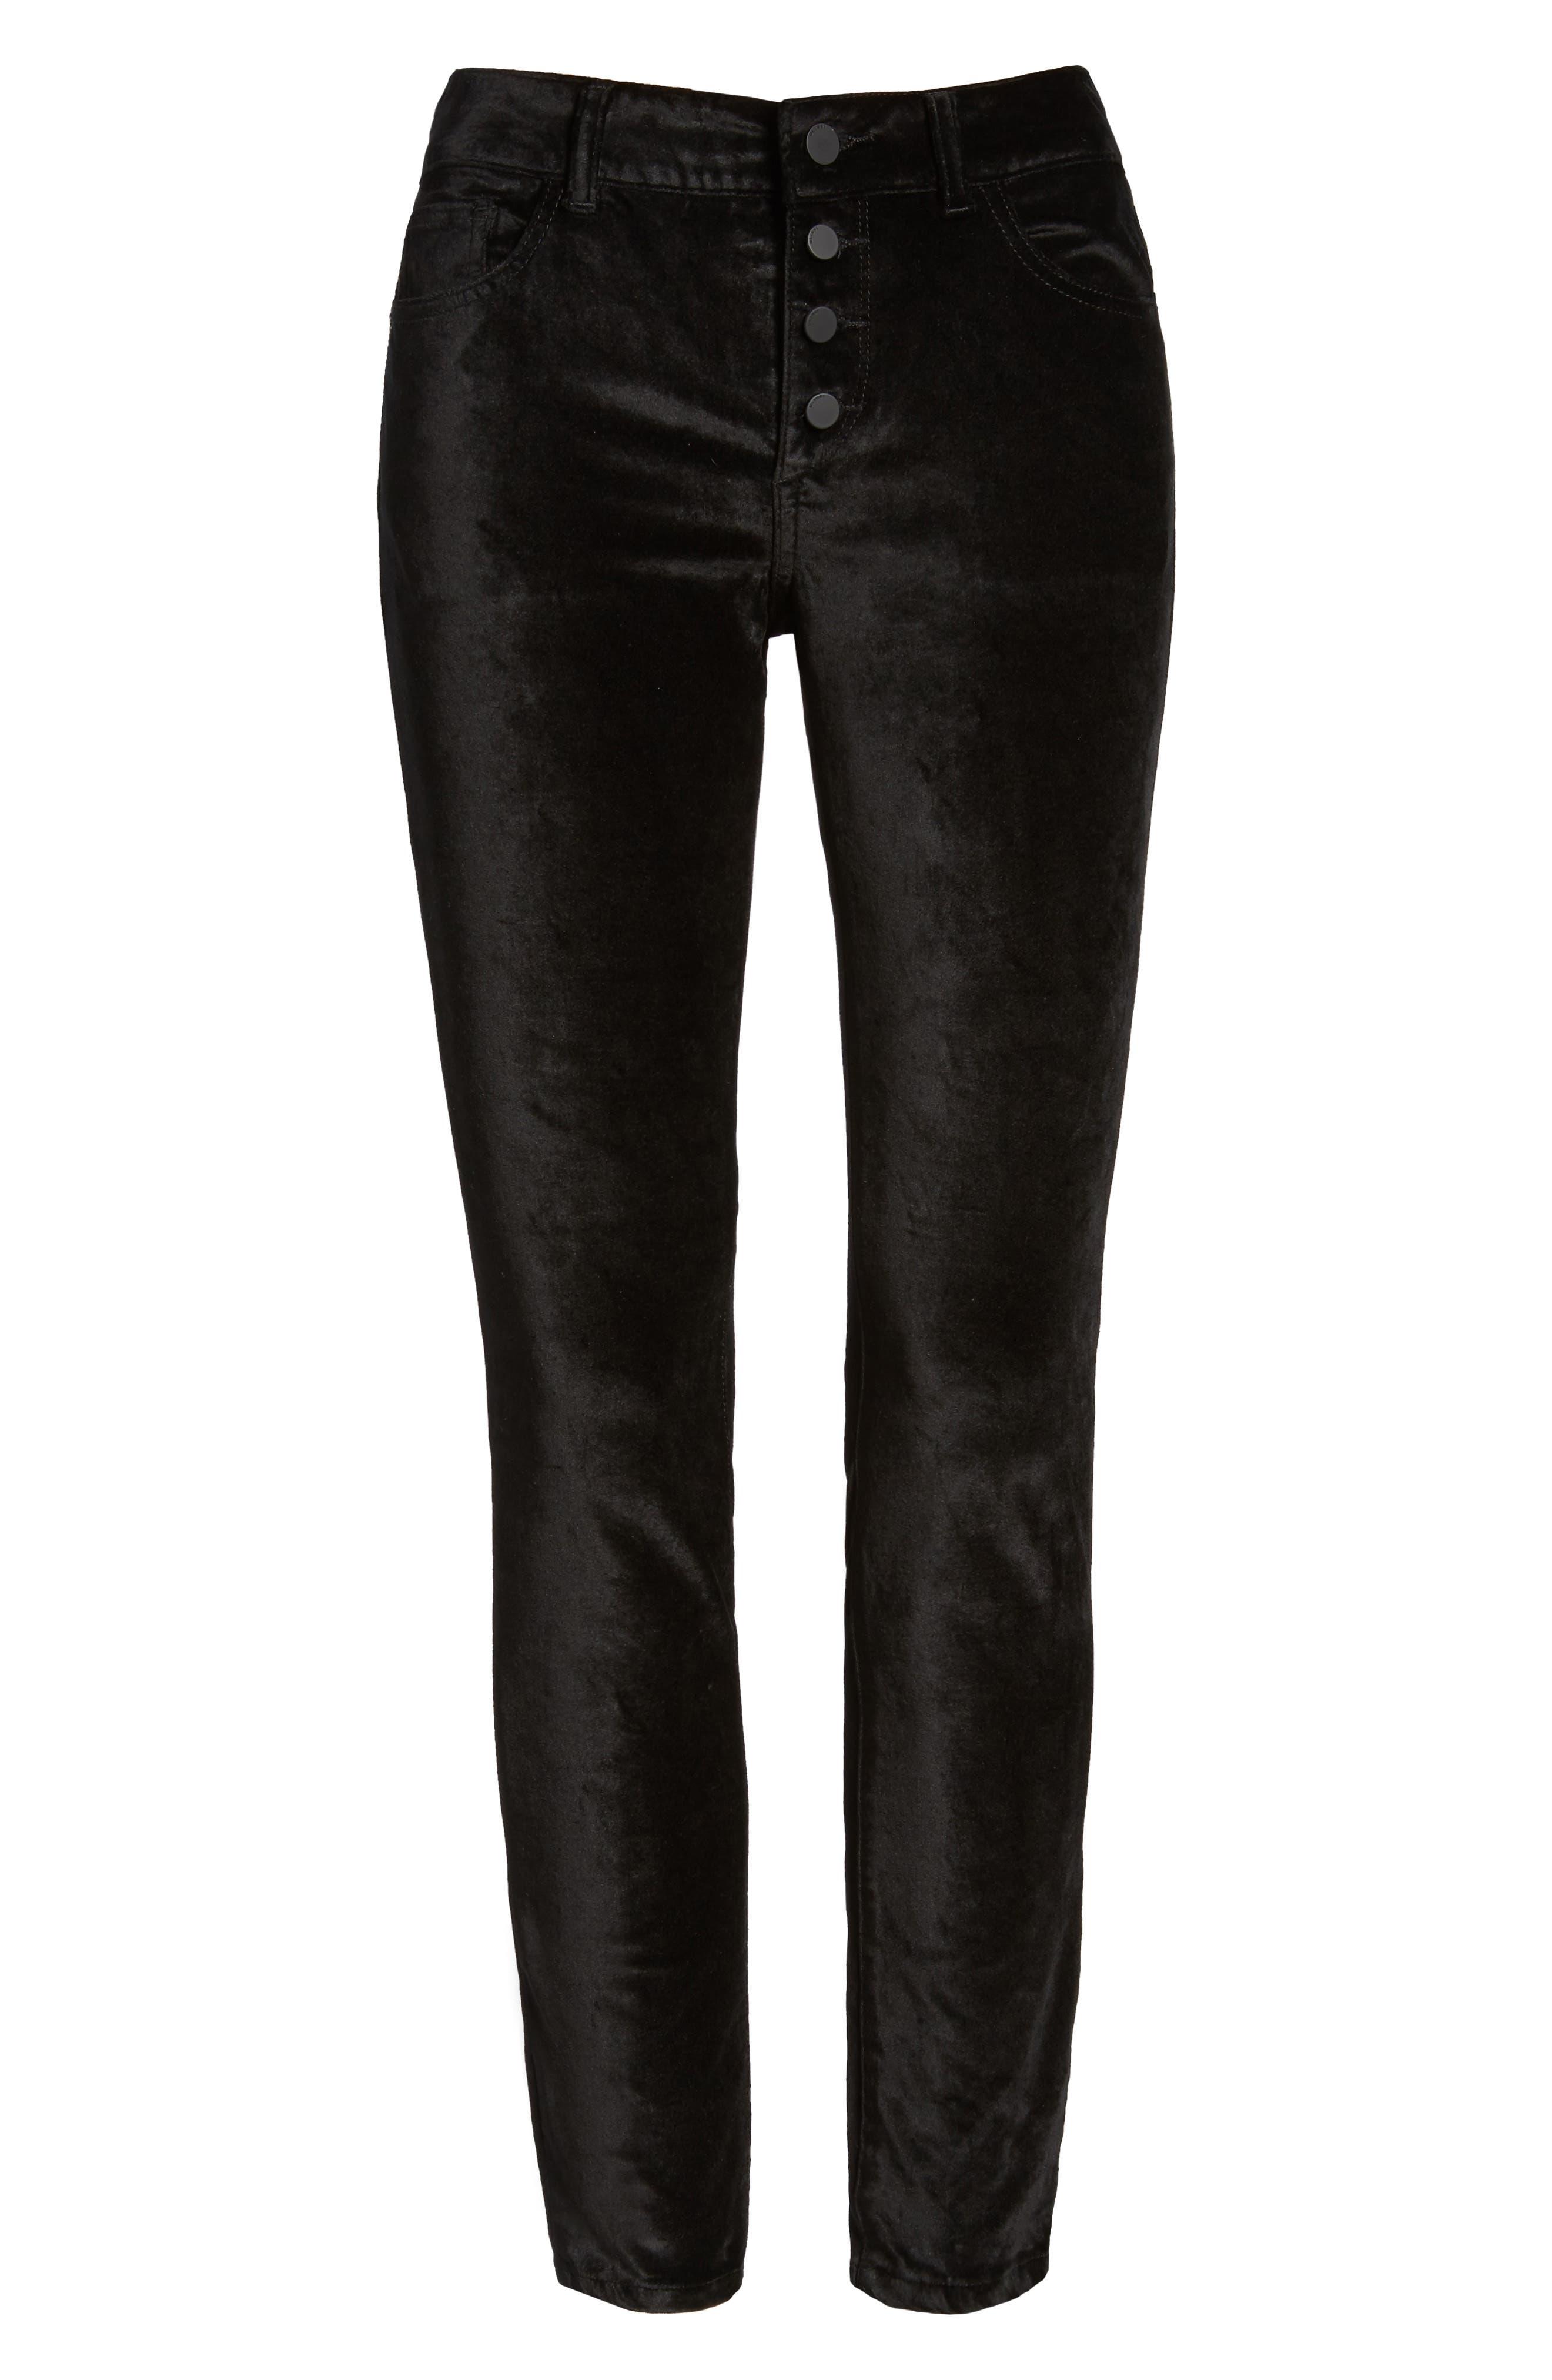 Emma Power Legging Jeans,                             Alternate thumbnail 6, color,                             001